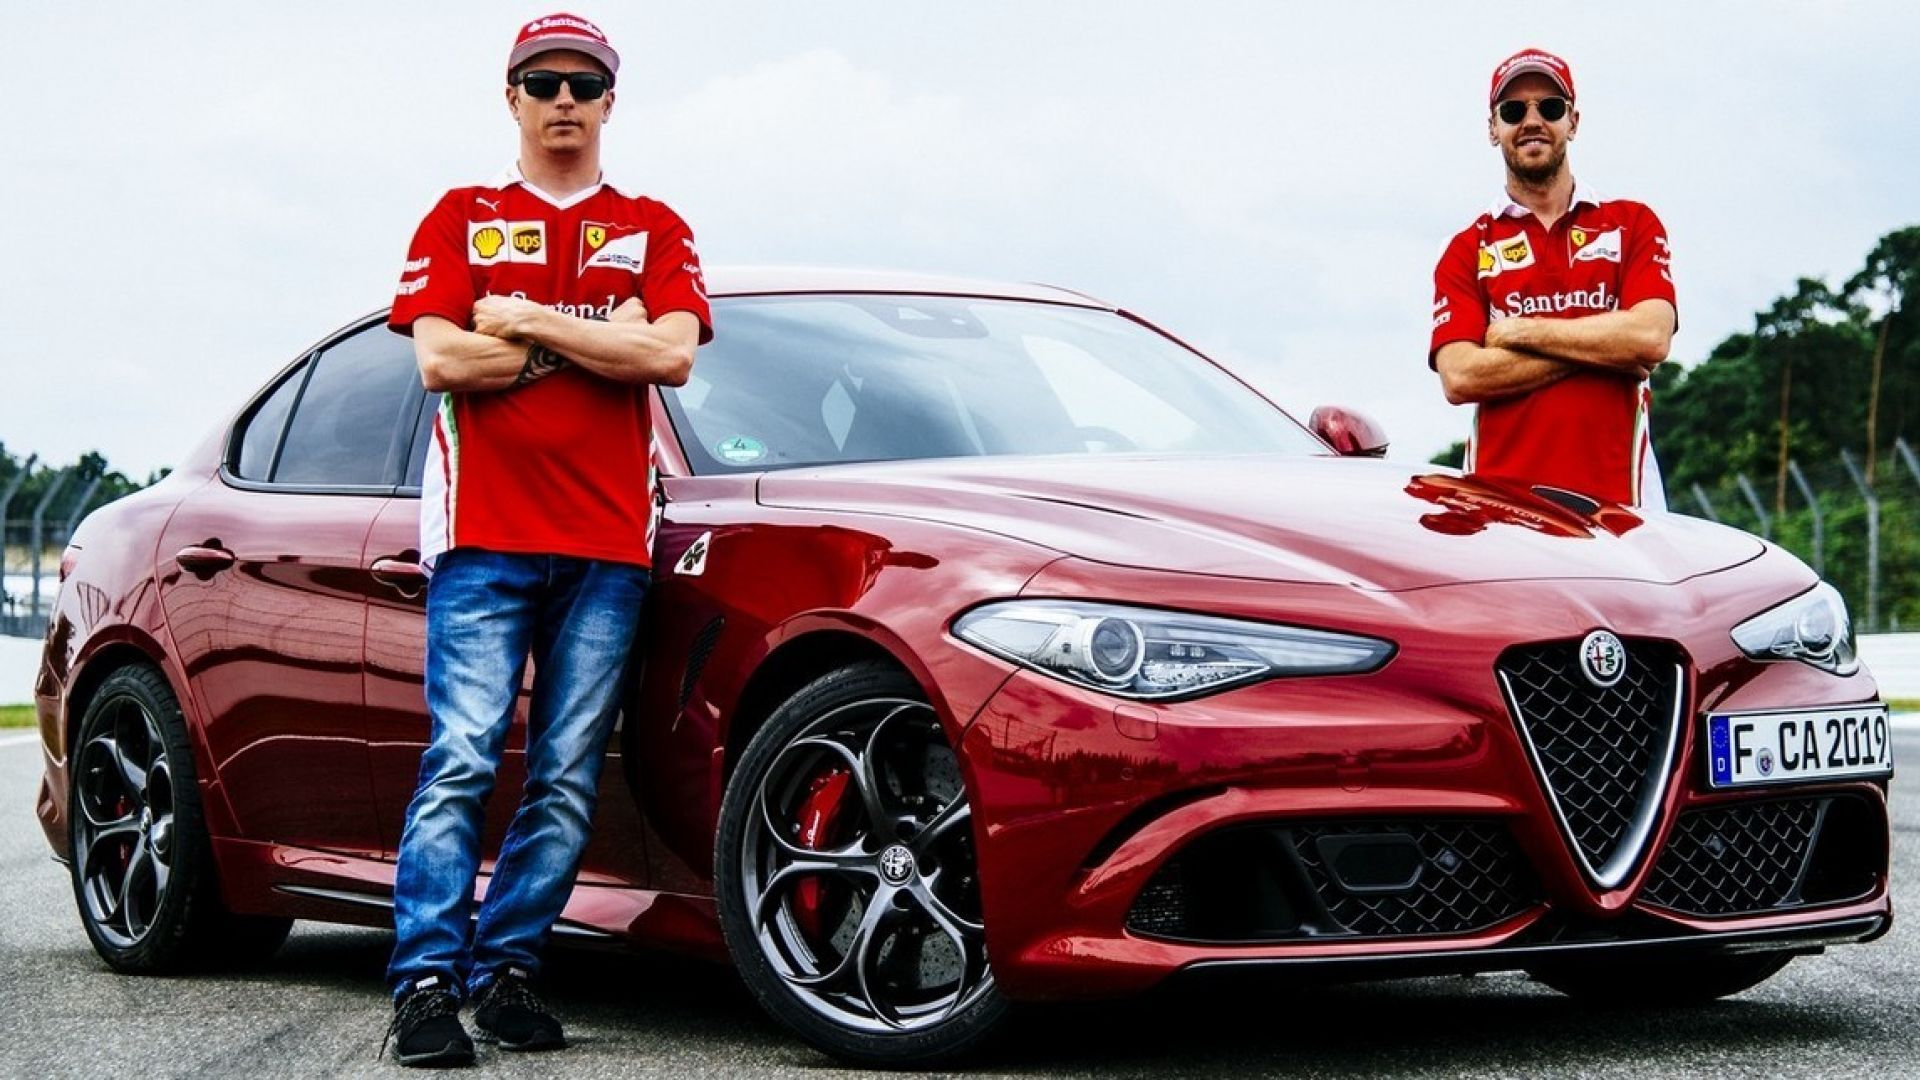 Alfa Romeo main sponsor per Sauber con i piloti Ferrari in ...